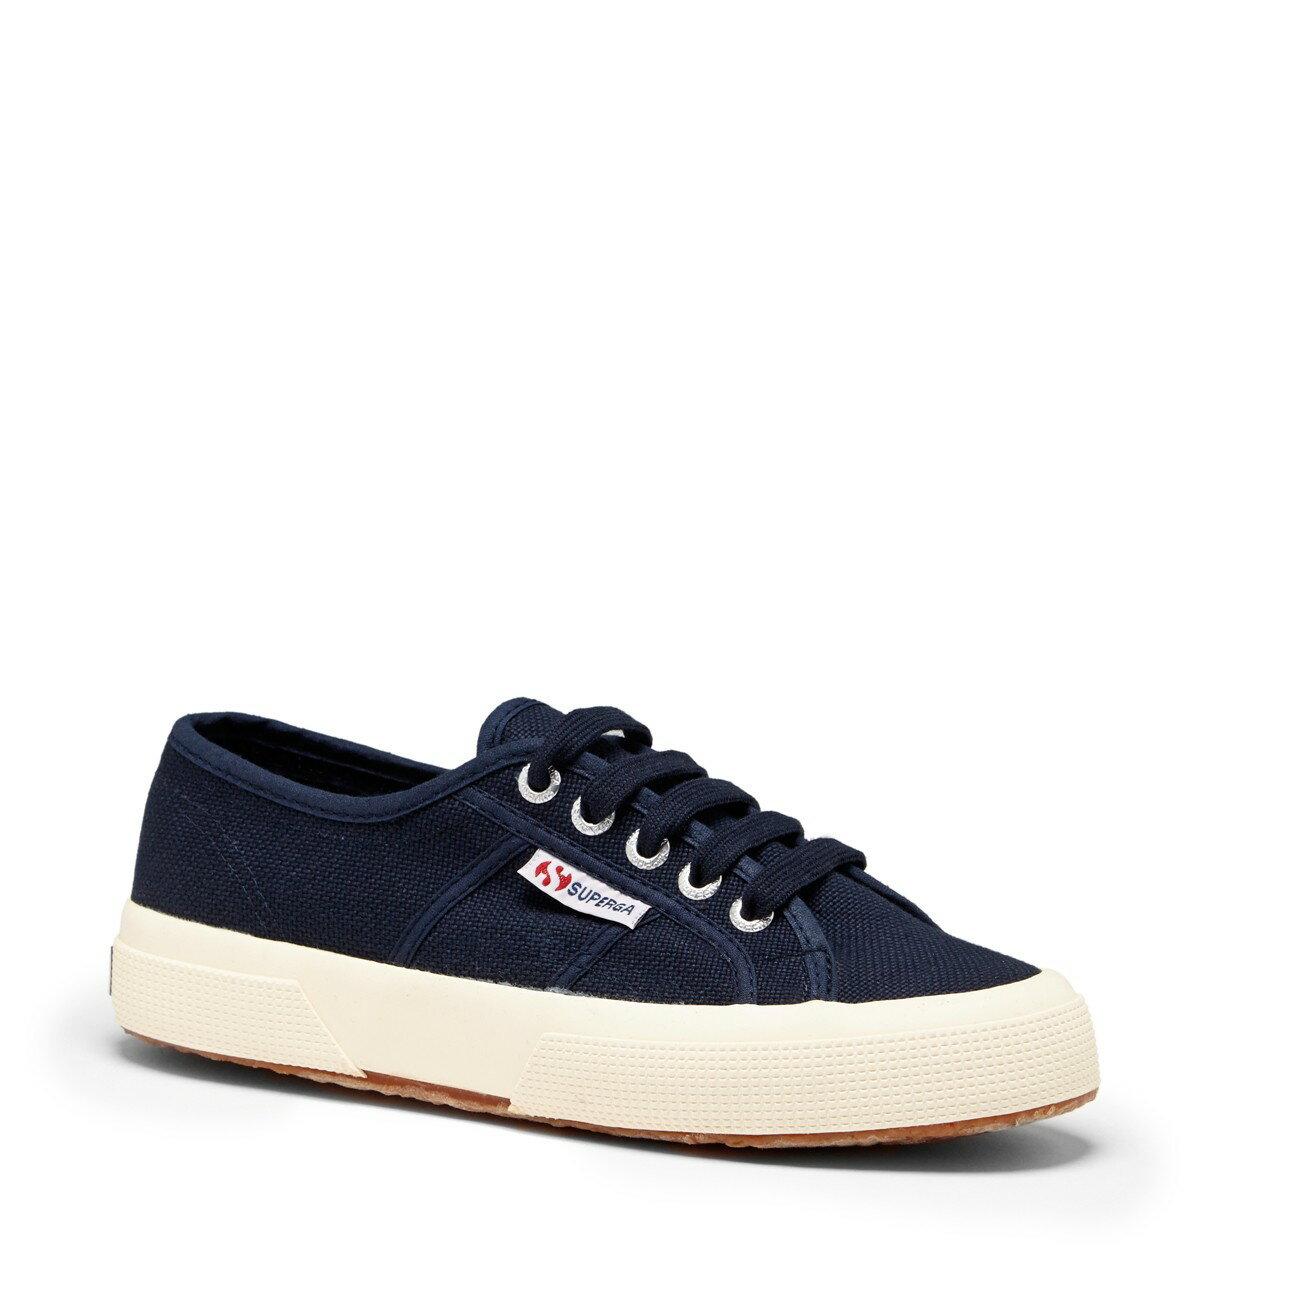 【SUPERGA】義大利國民鞋-深藍 0